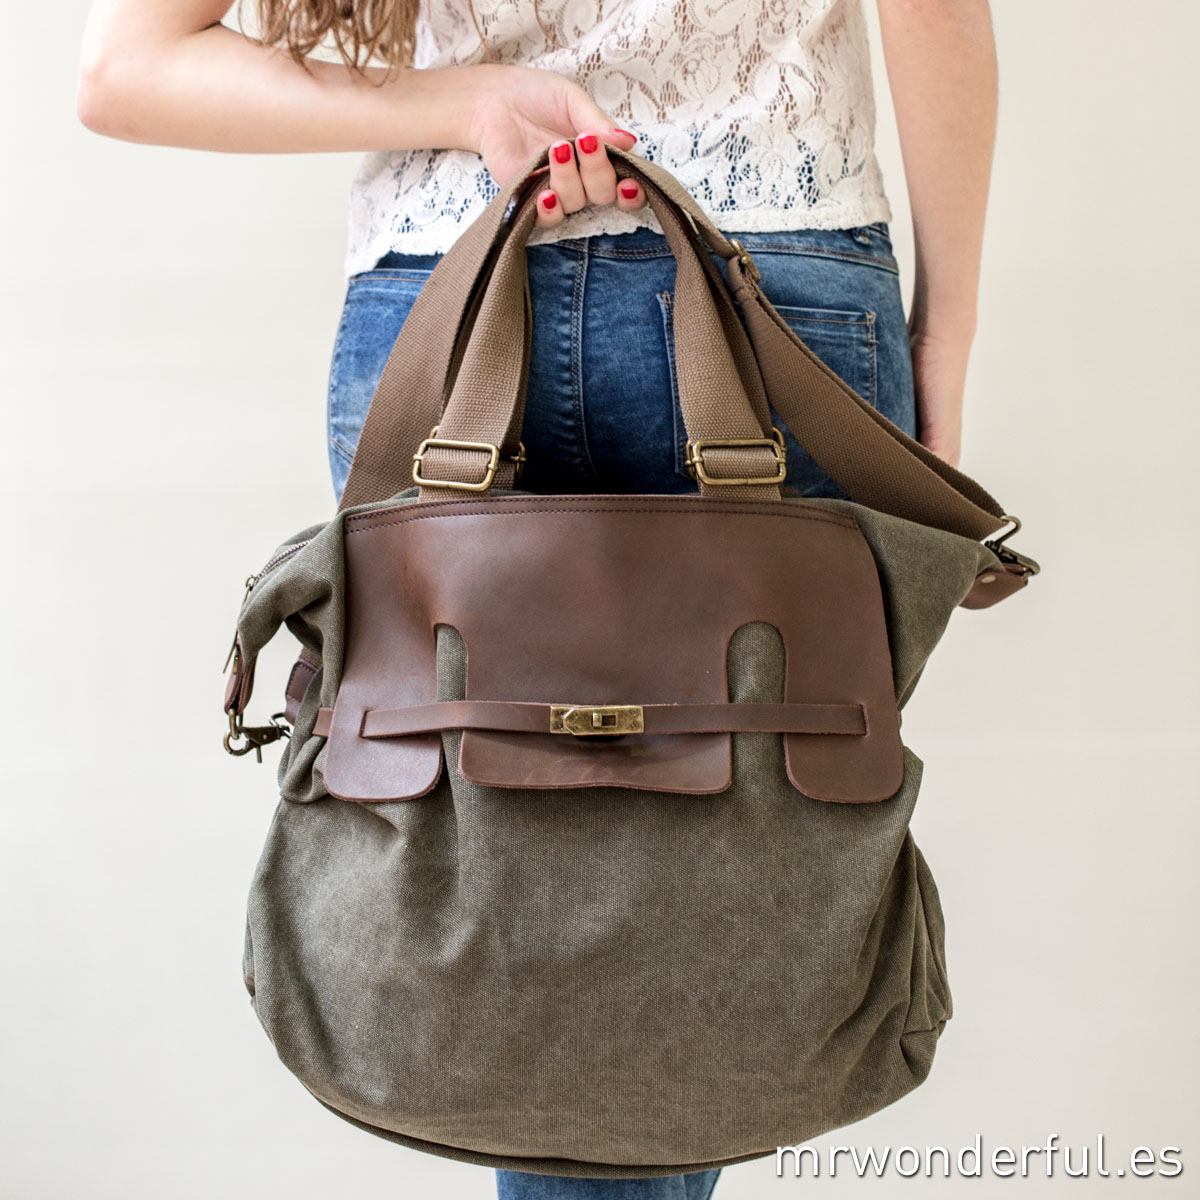 mrwonderful_bags_W2042-Olive-14